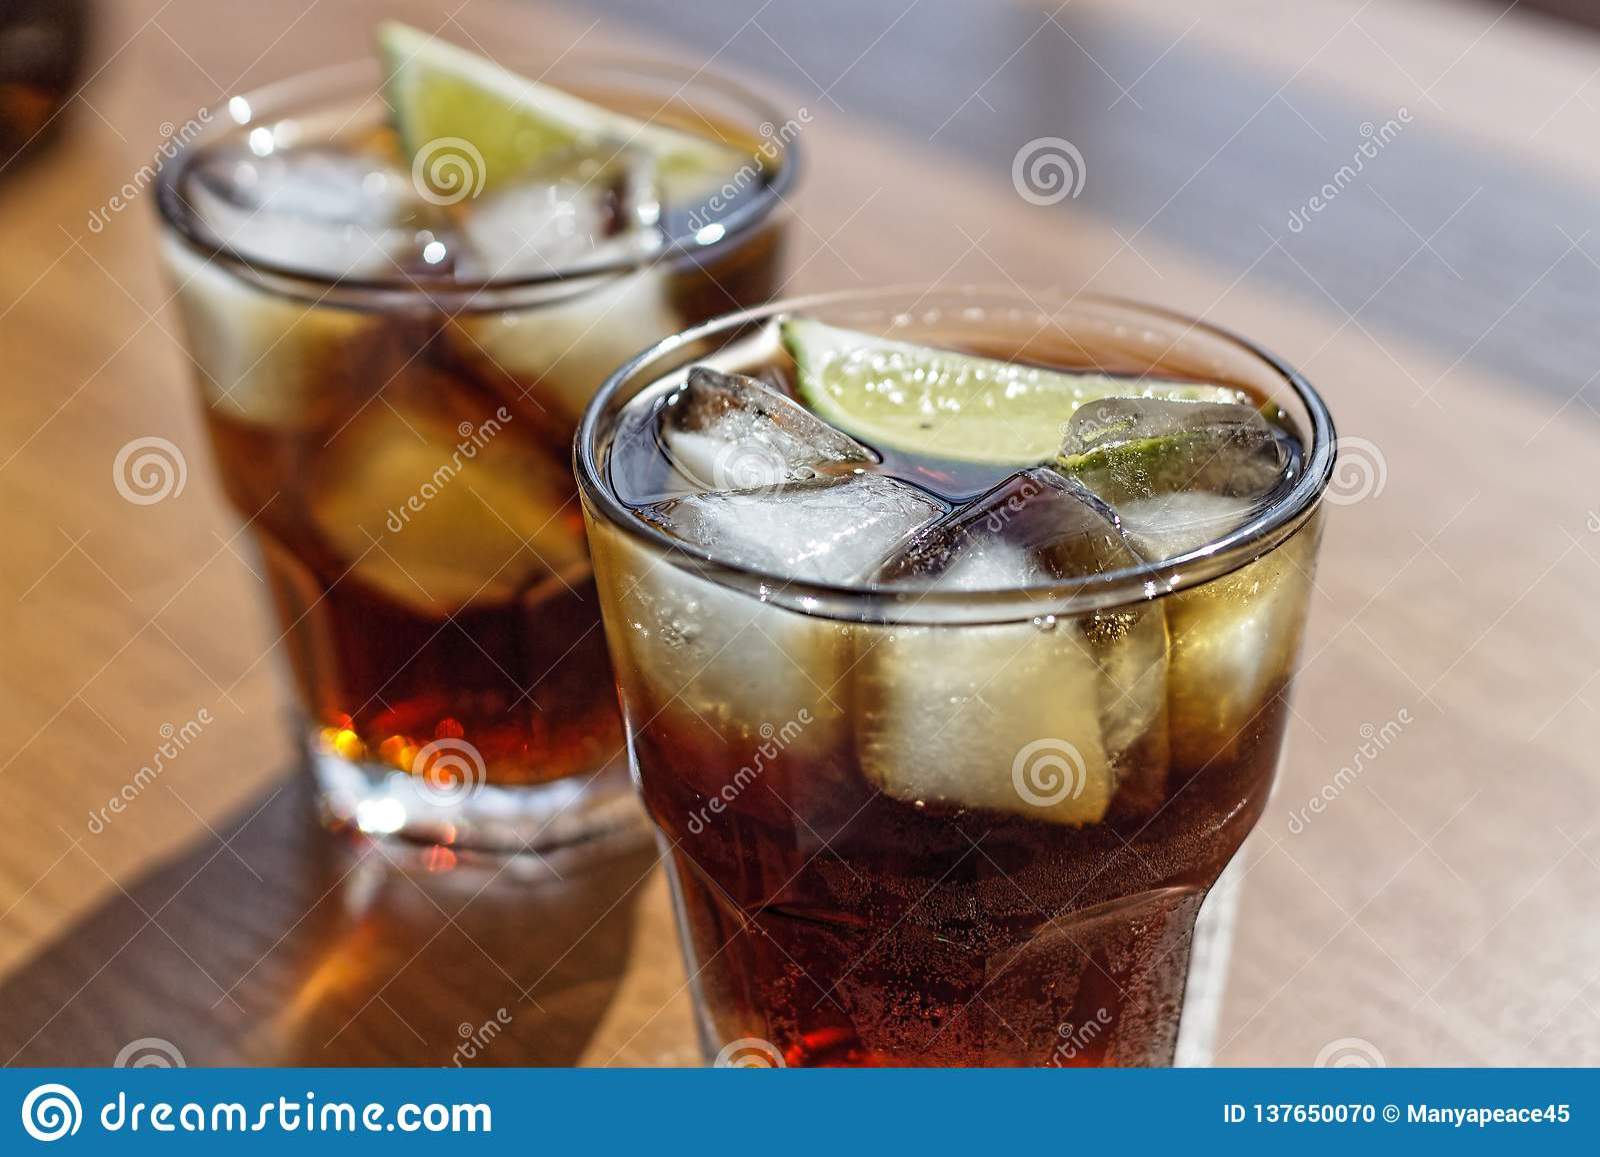 Rum, Cola, Cuba Libre, alcohol, ice, rum, glass, cocktail, refreshment, lime, cuba